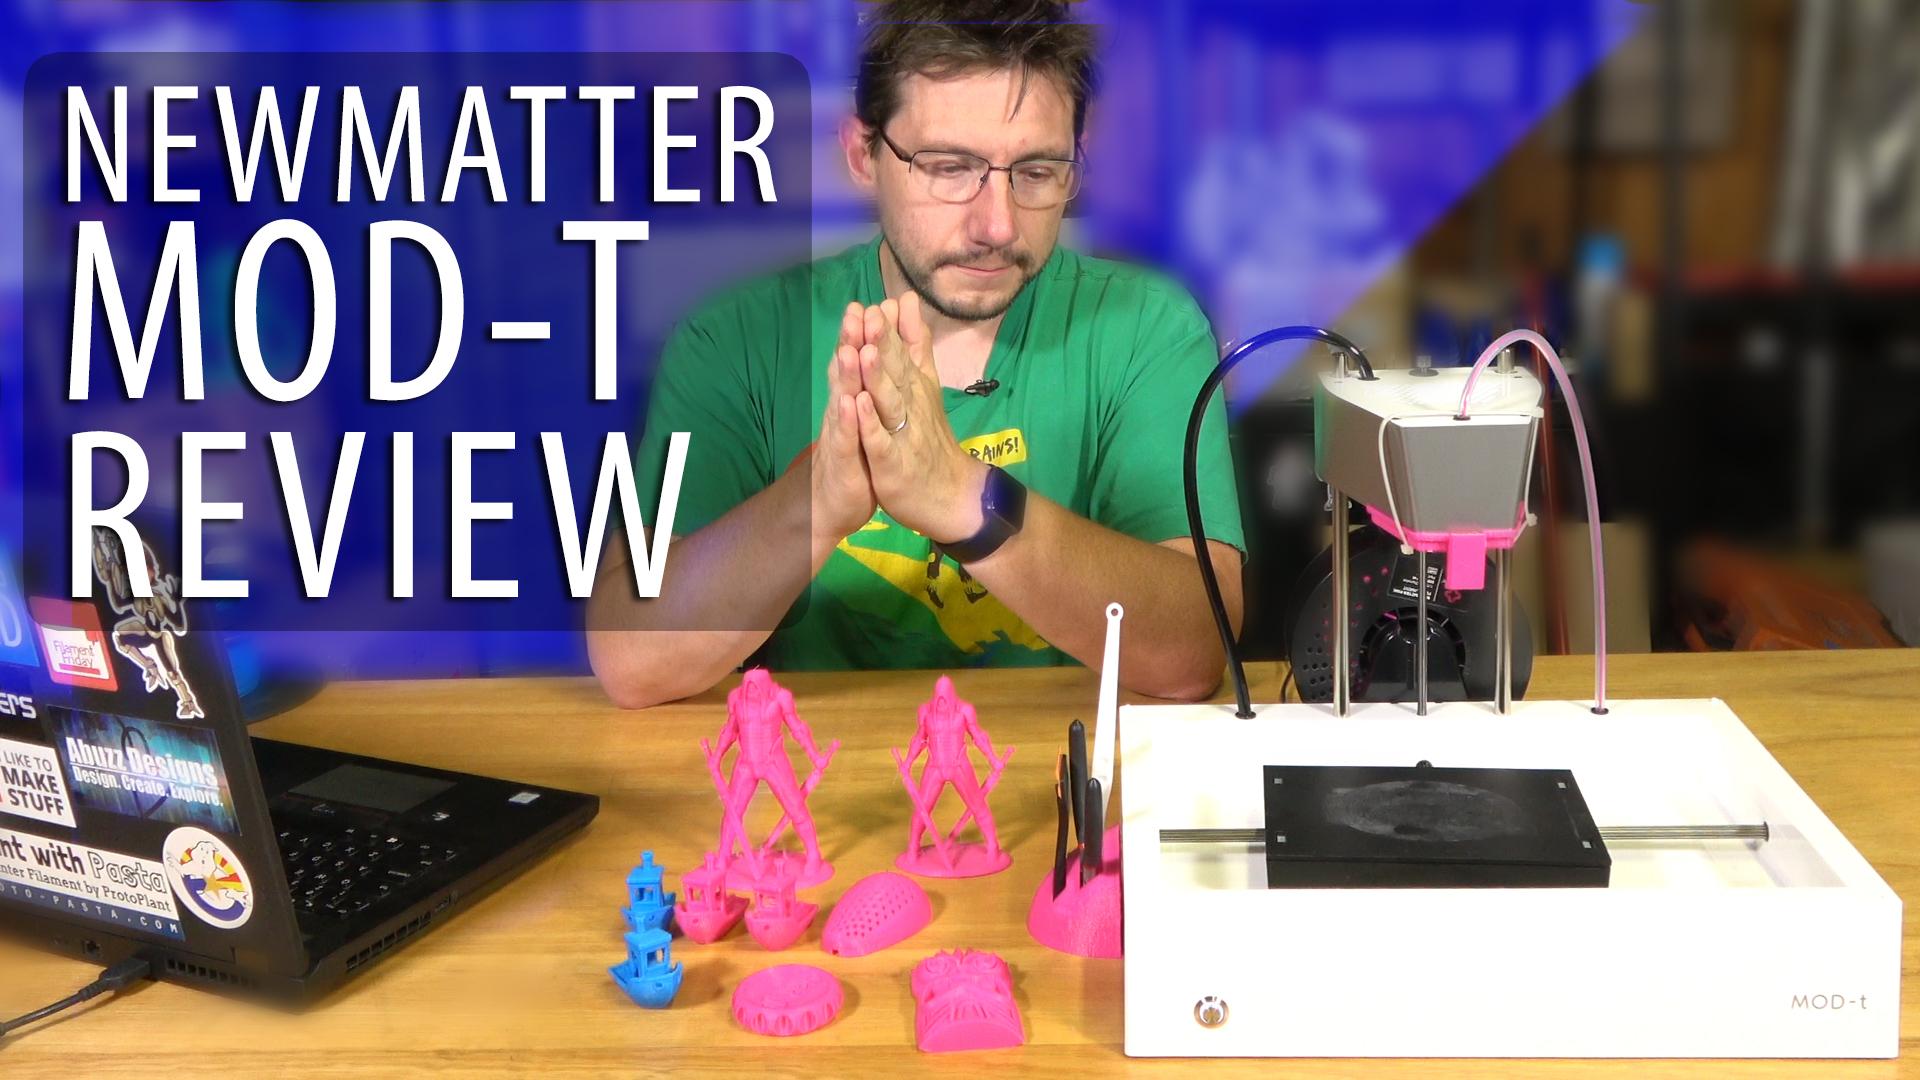 Newmatter MOD-t Review